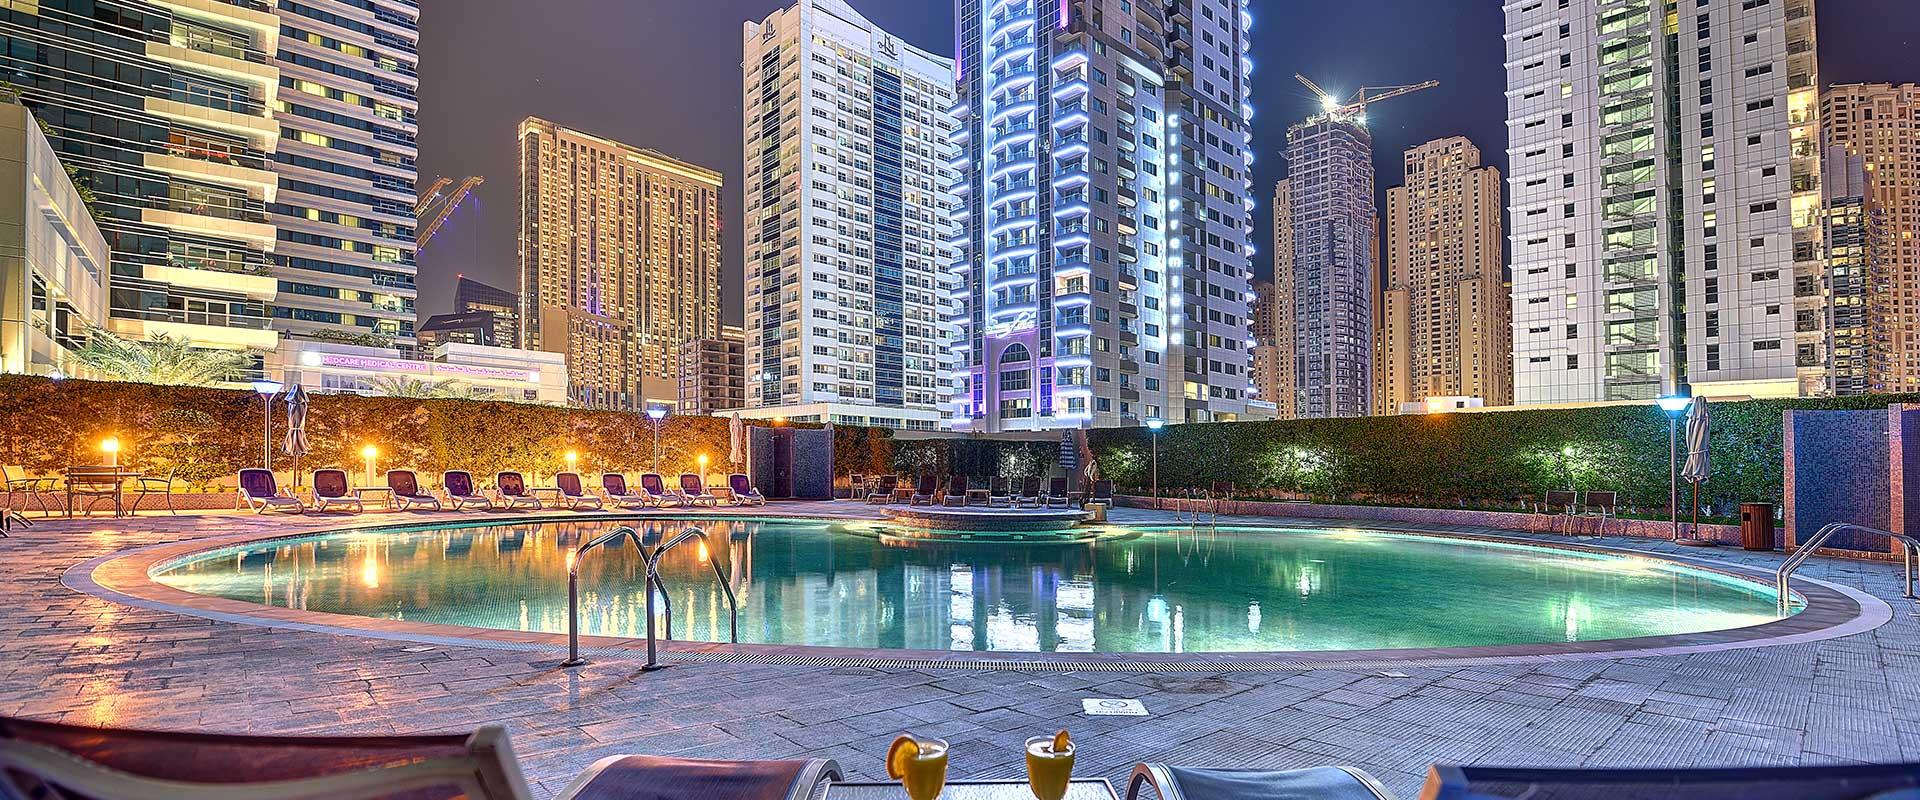 4 star luxury hotel apartments in dubai marina marina for Luxury hotels in dubai marina